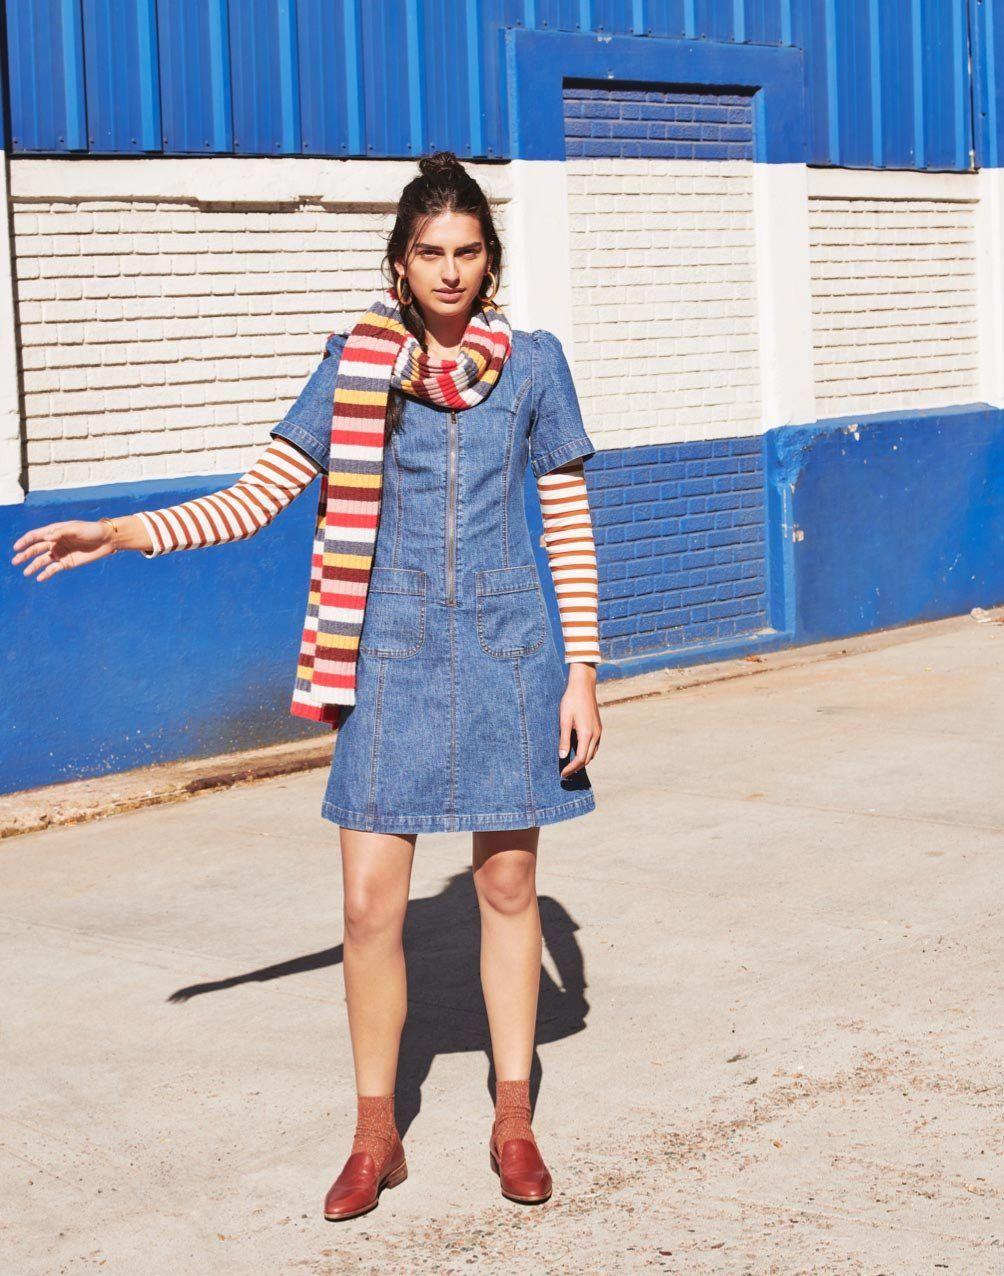 337d69ef22 madewell denim a-line zip dress, carousel stripe scarf, northside  long-sleeve vintage tee, the frances loafer + night sparkle ribbed ankle  socks.